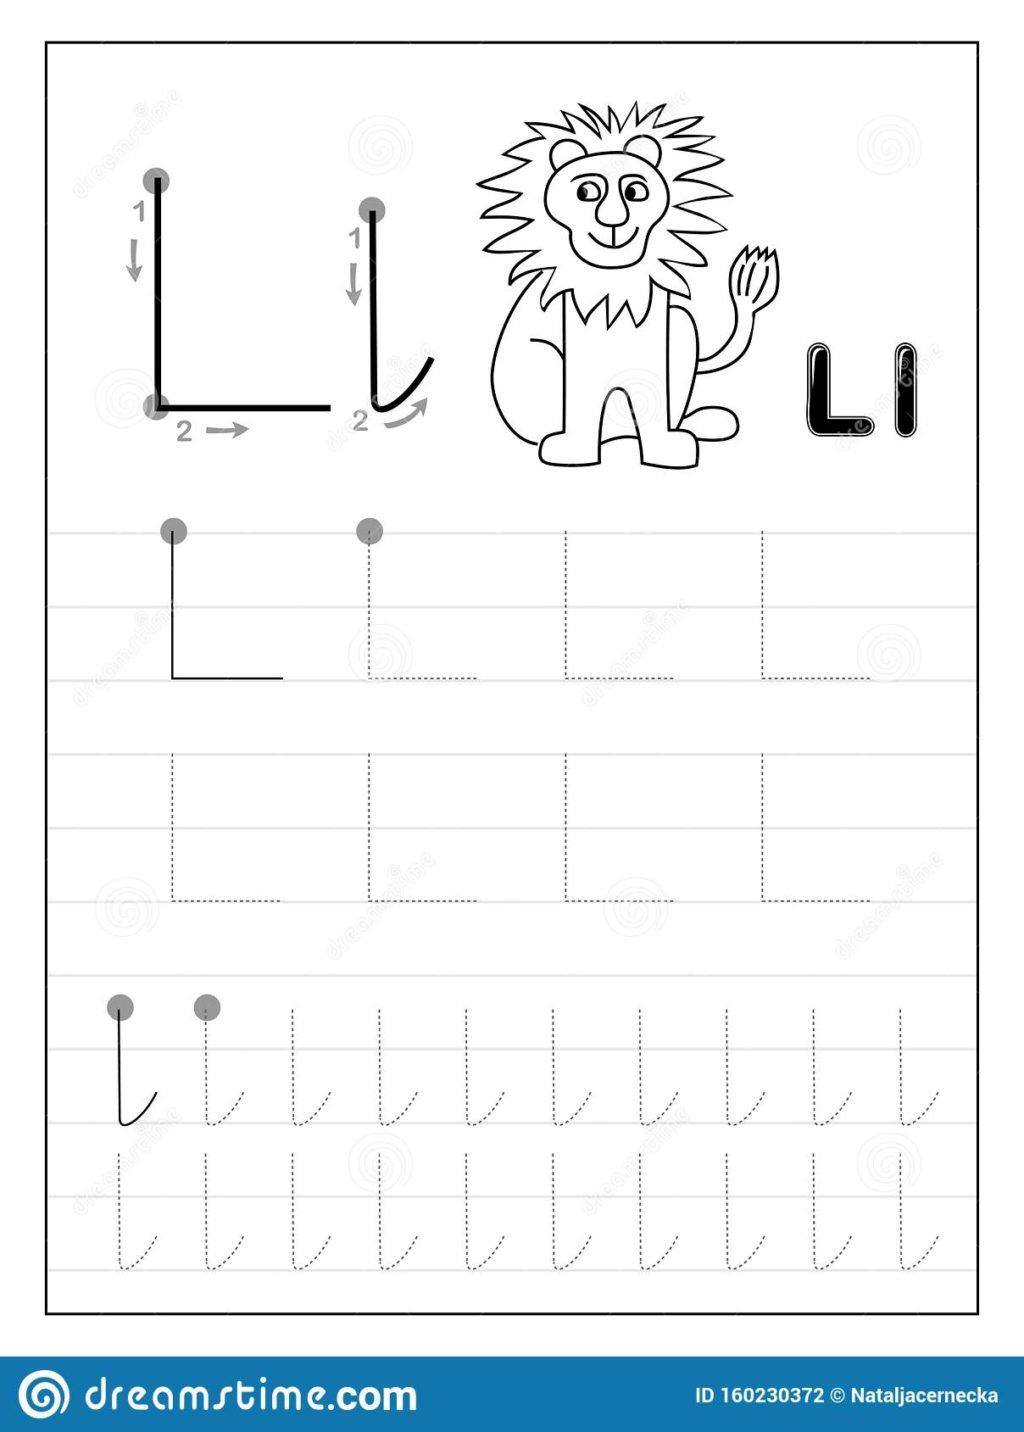 Worksheet ~ Tracing Alphabet Letter L Black And White